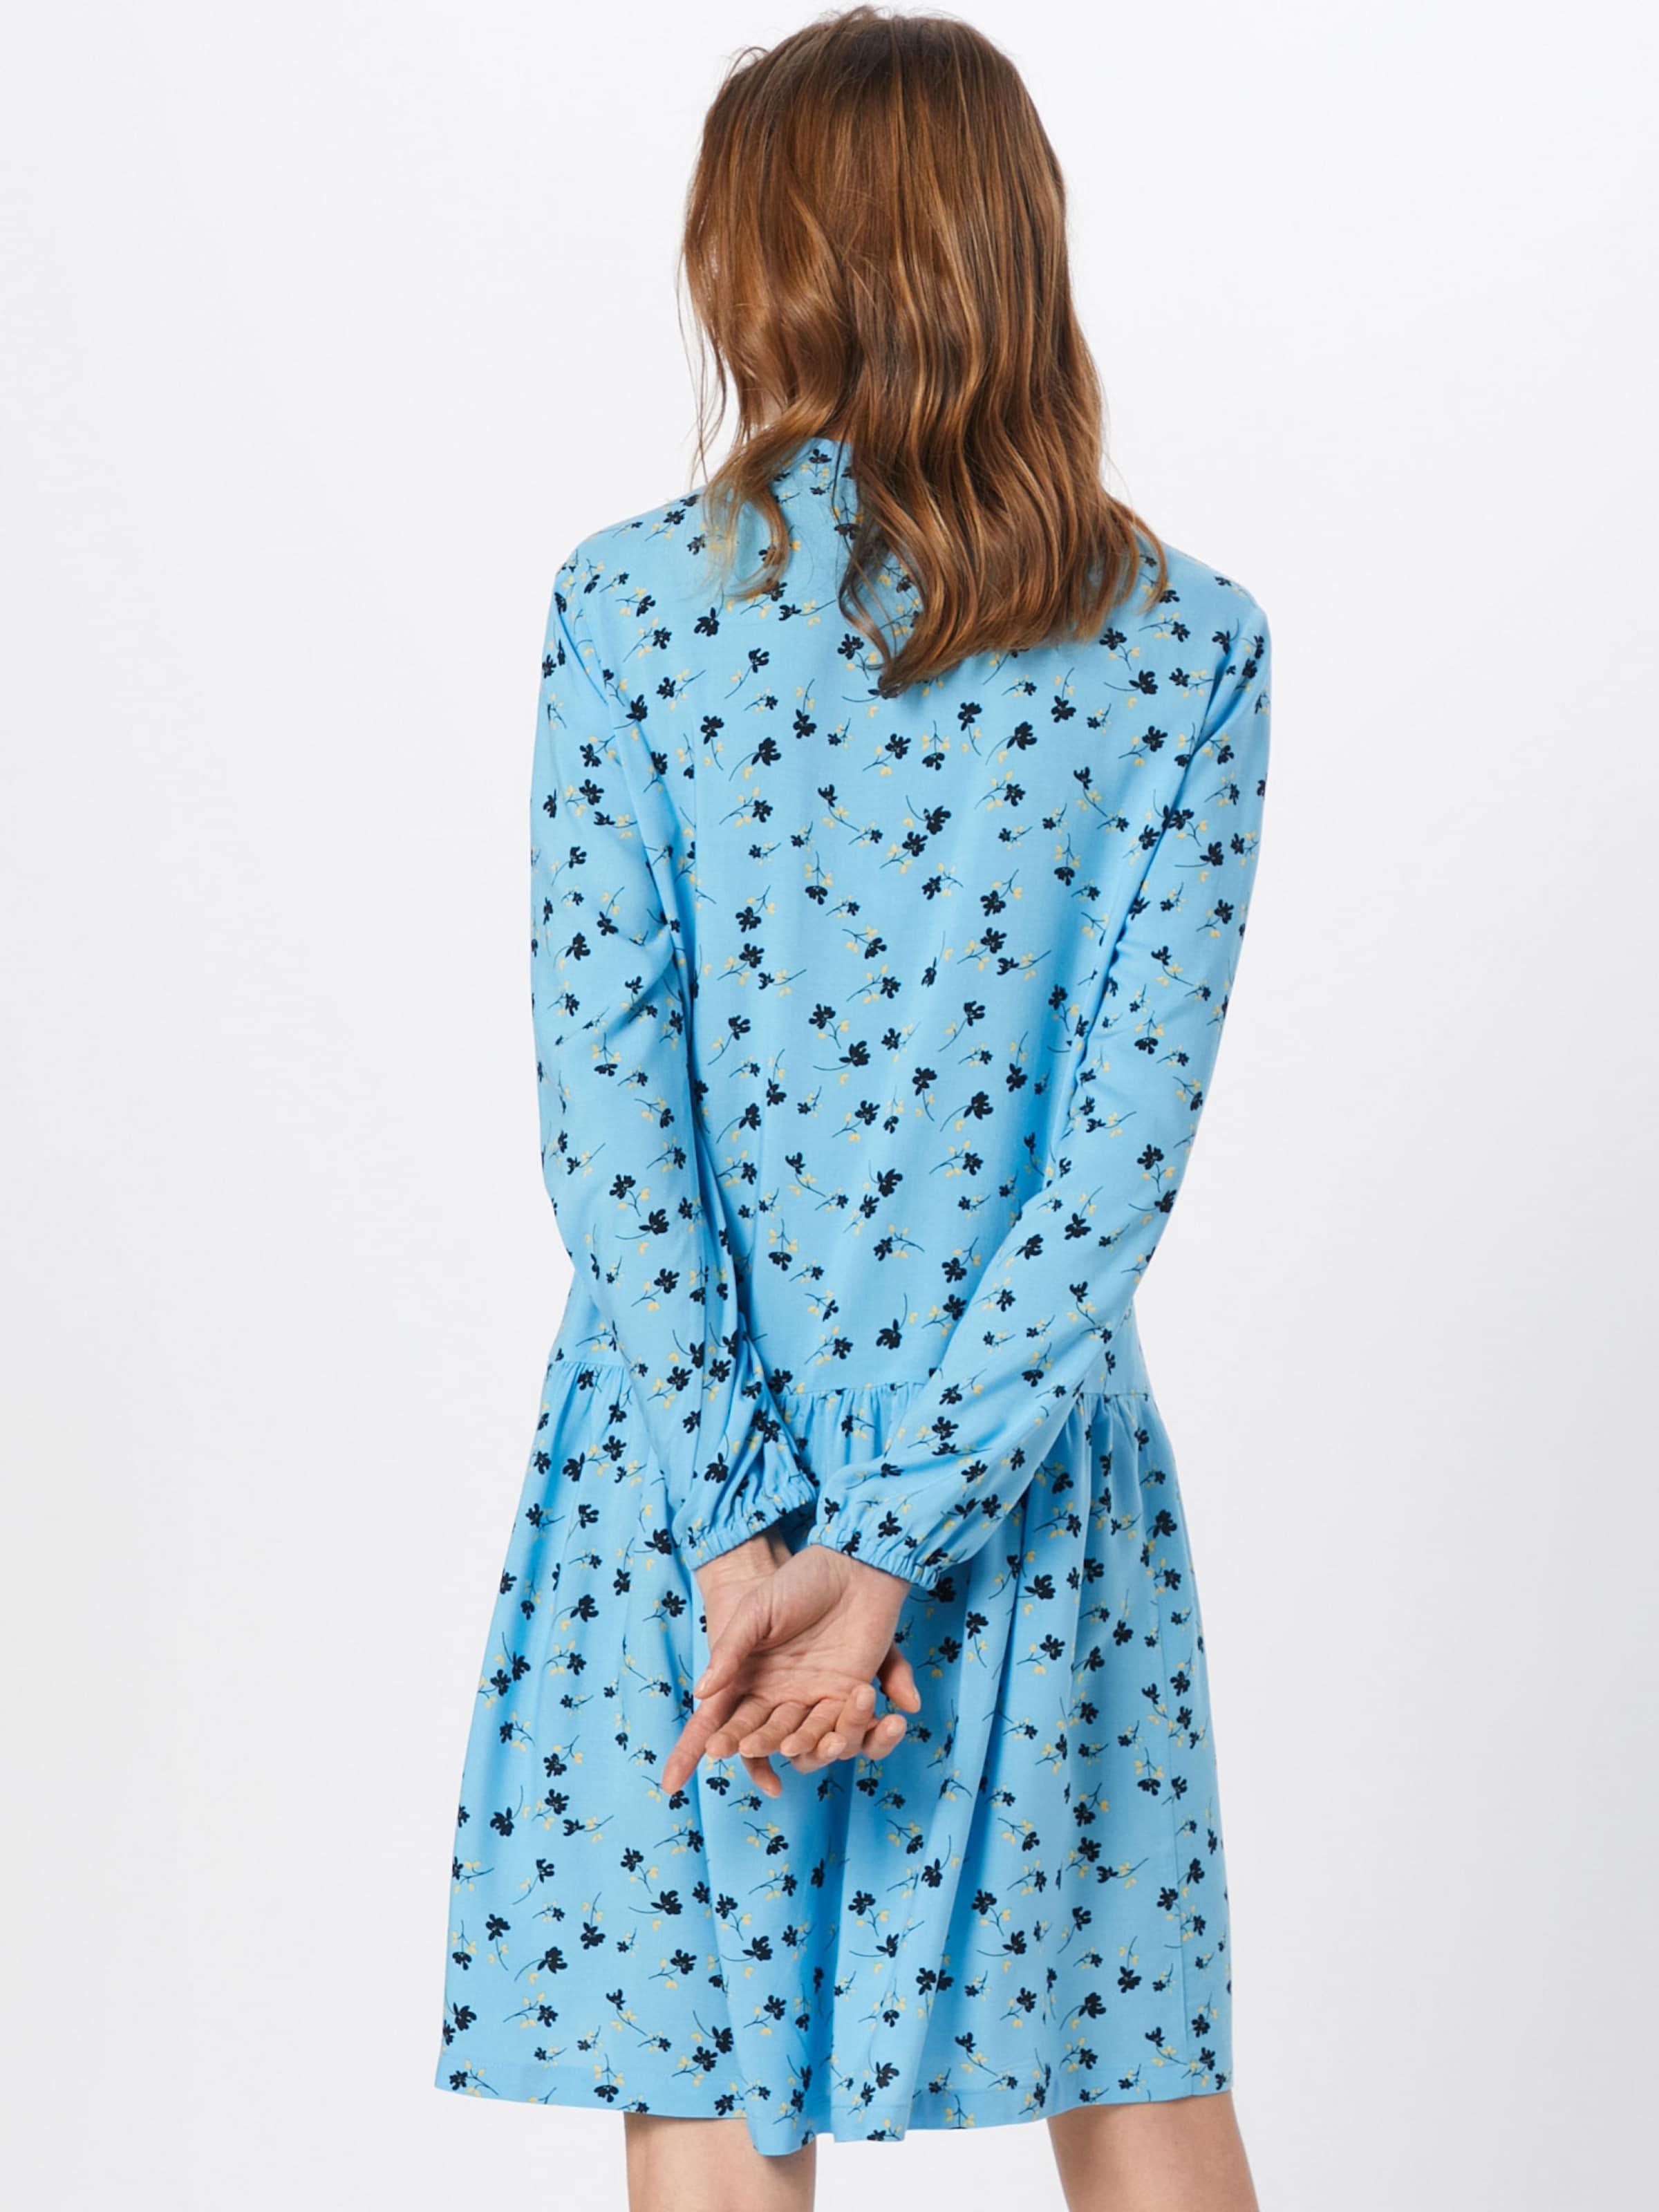 HellblauDunkelblau Kleid In Gelb Copenhagen 'turid' Moss zSVpqUMG